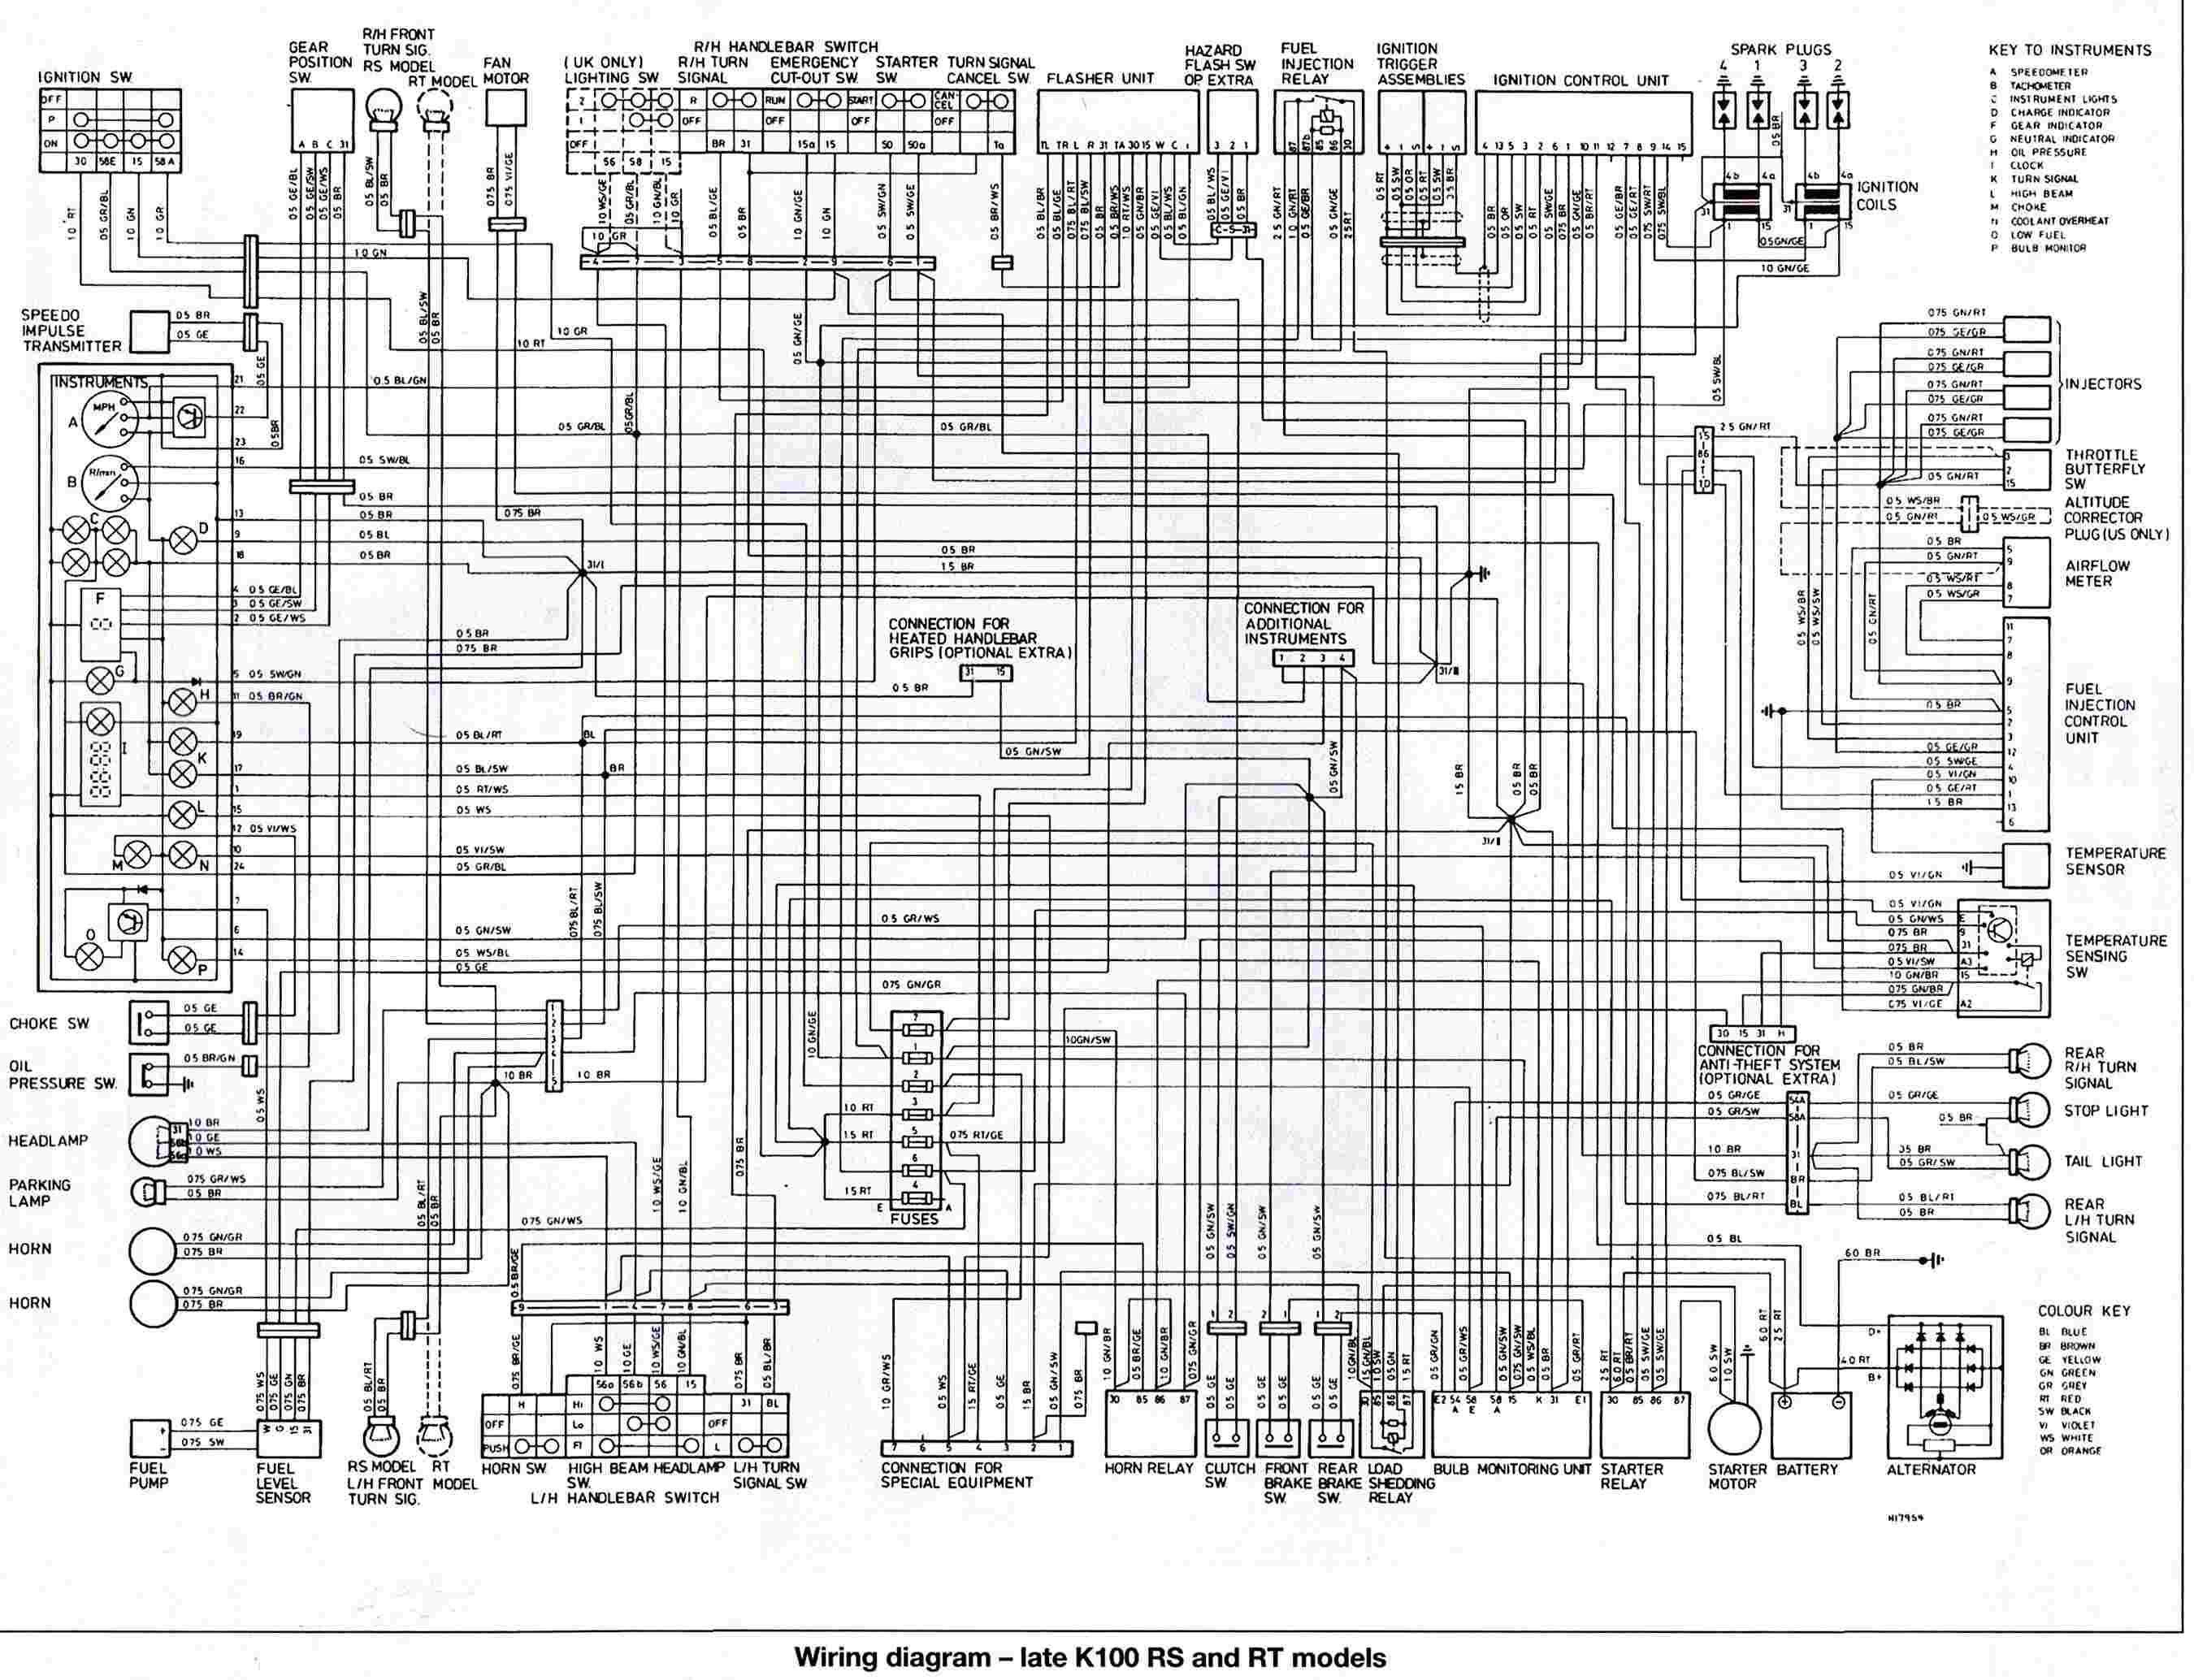 medium resolution of k100 wiring diagram wiring diagram page bmw k100 wiring diagrams wiring diagram k100 wiring diagram